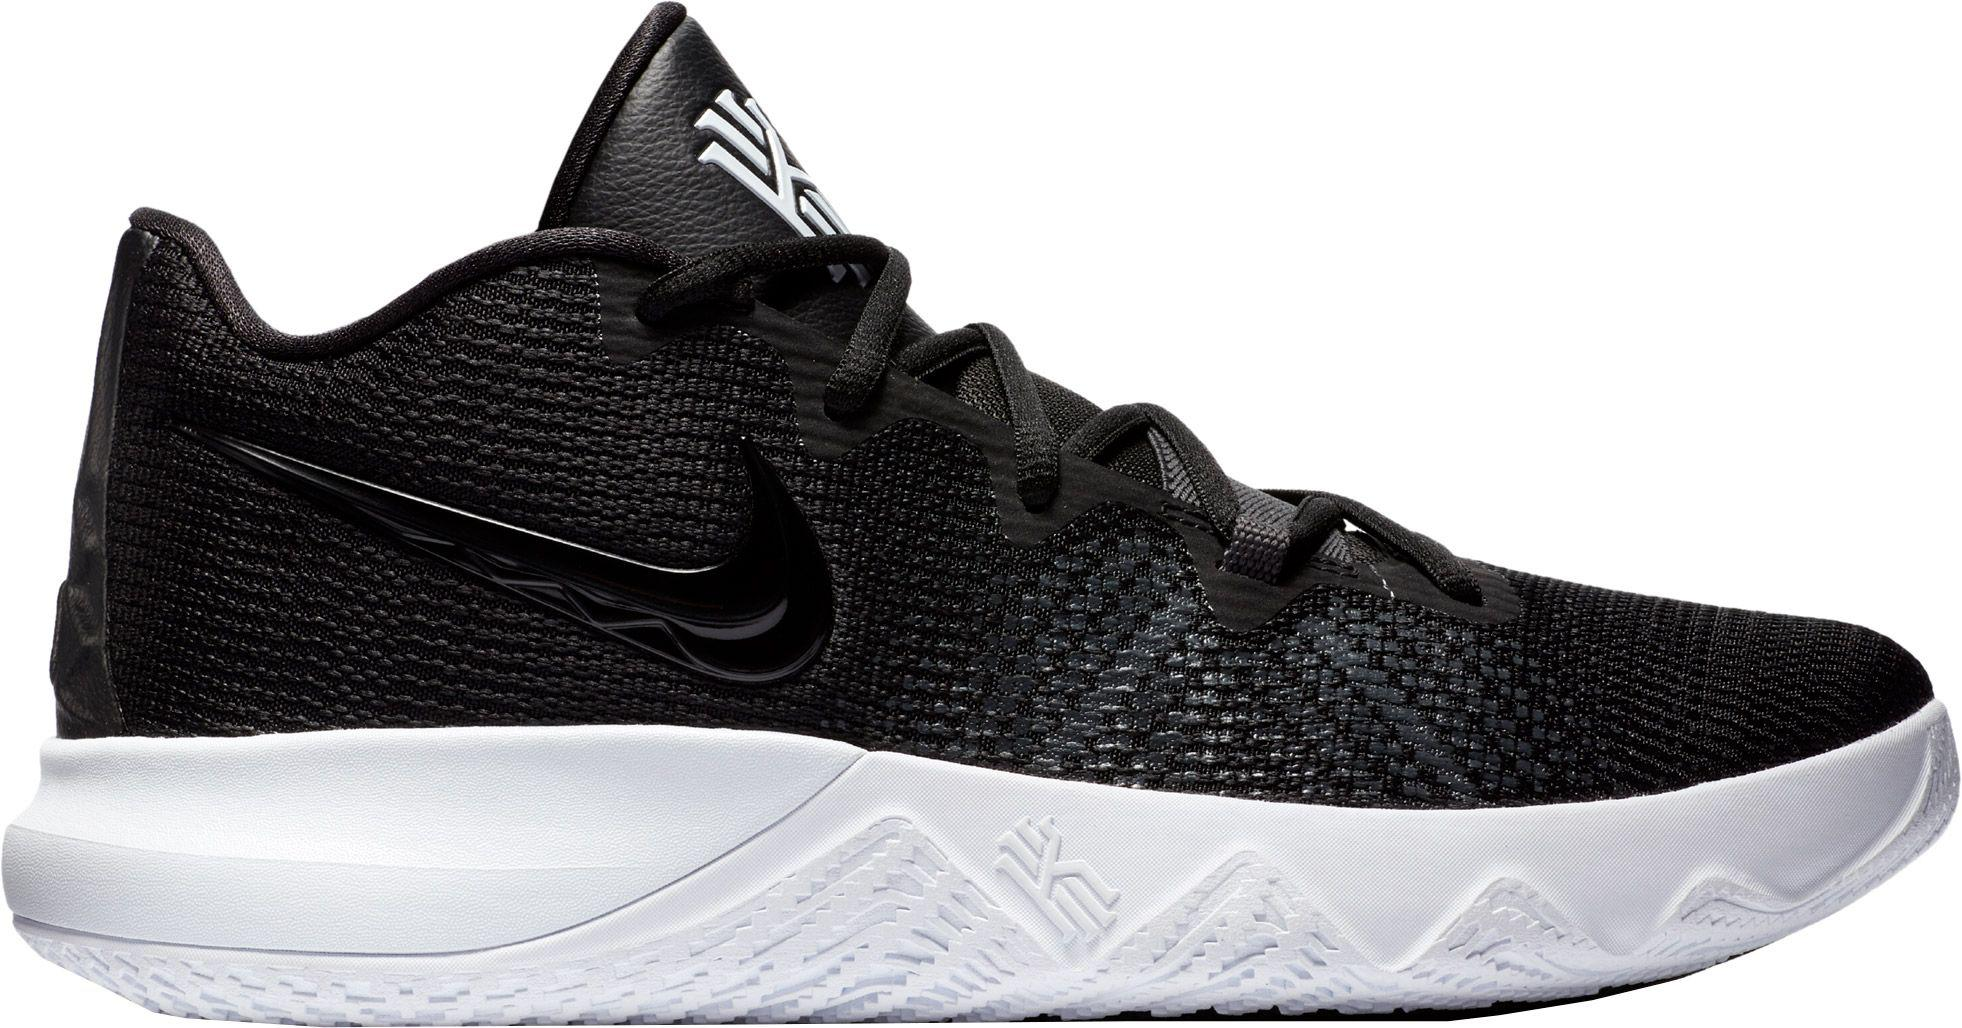 9d1d9e5950d Nike Kyrie Flytrap Basketball Shoes in Black for Men - Lyst